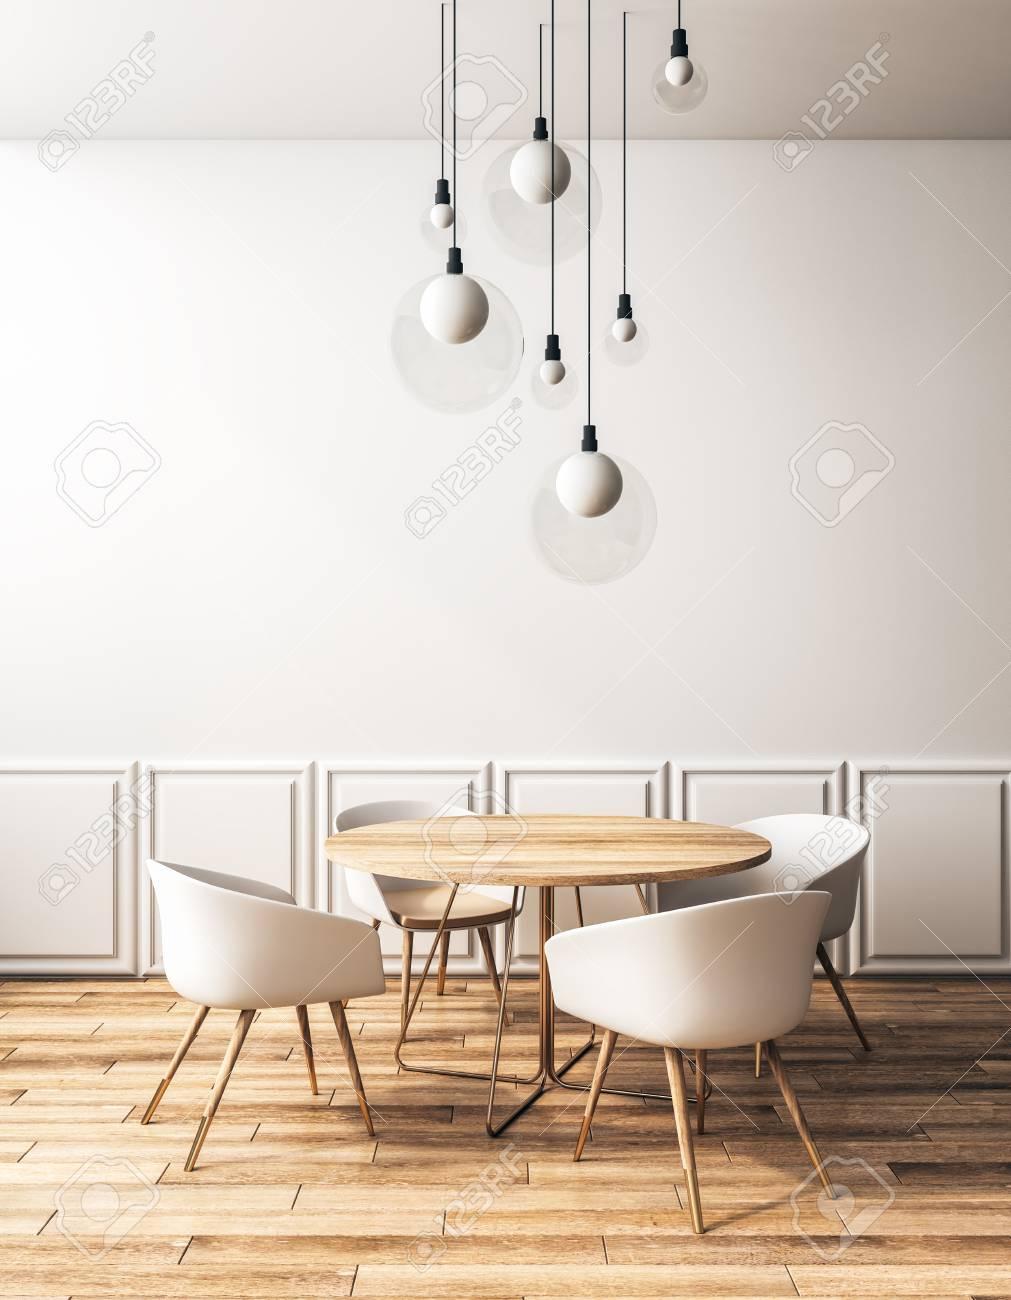 Contoh Desain Interior Desain Interior Cafe Klasik